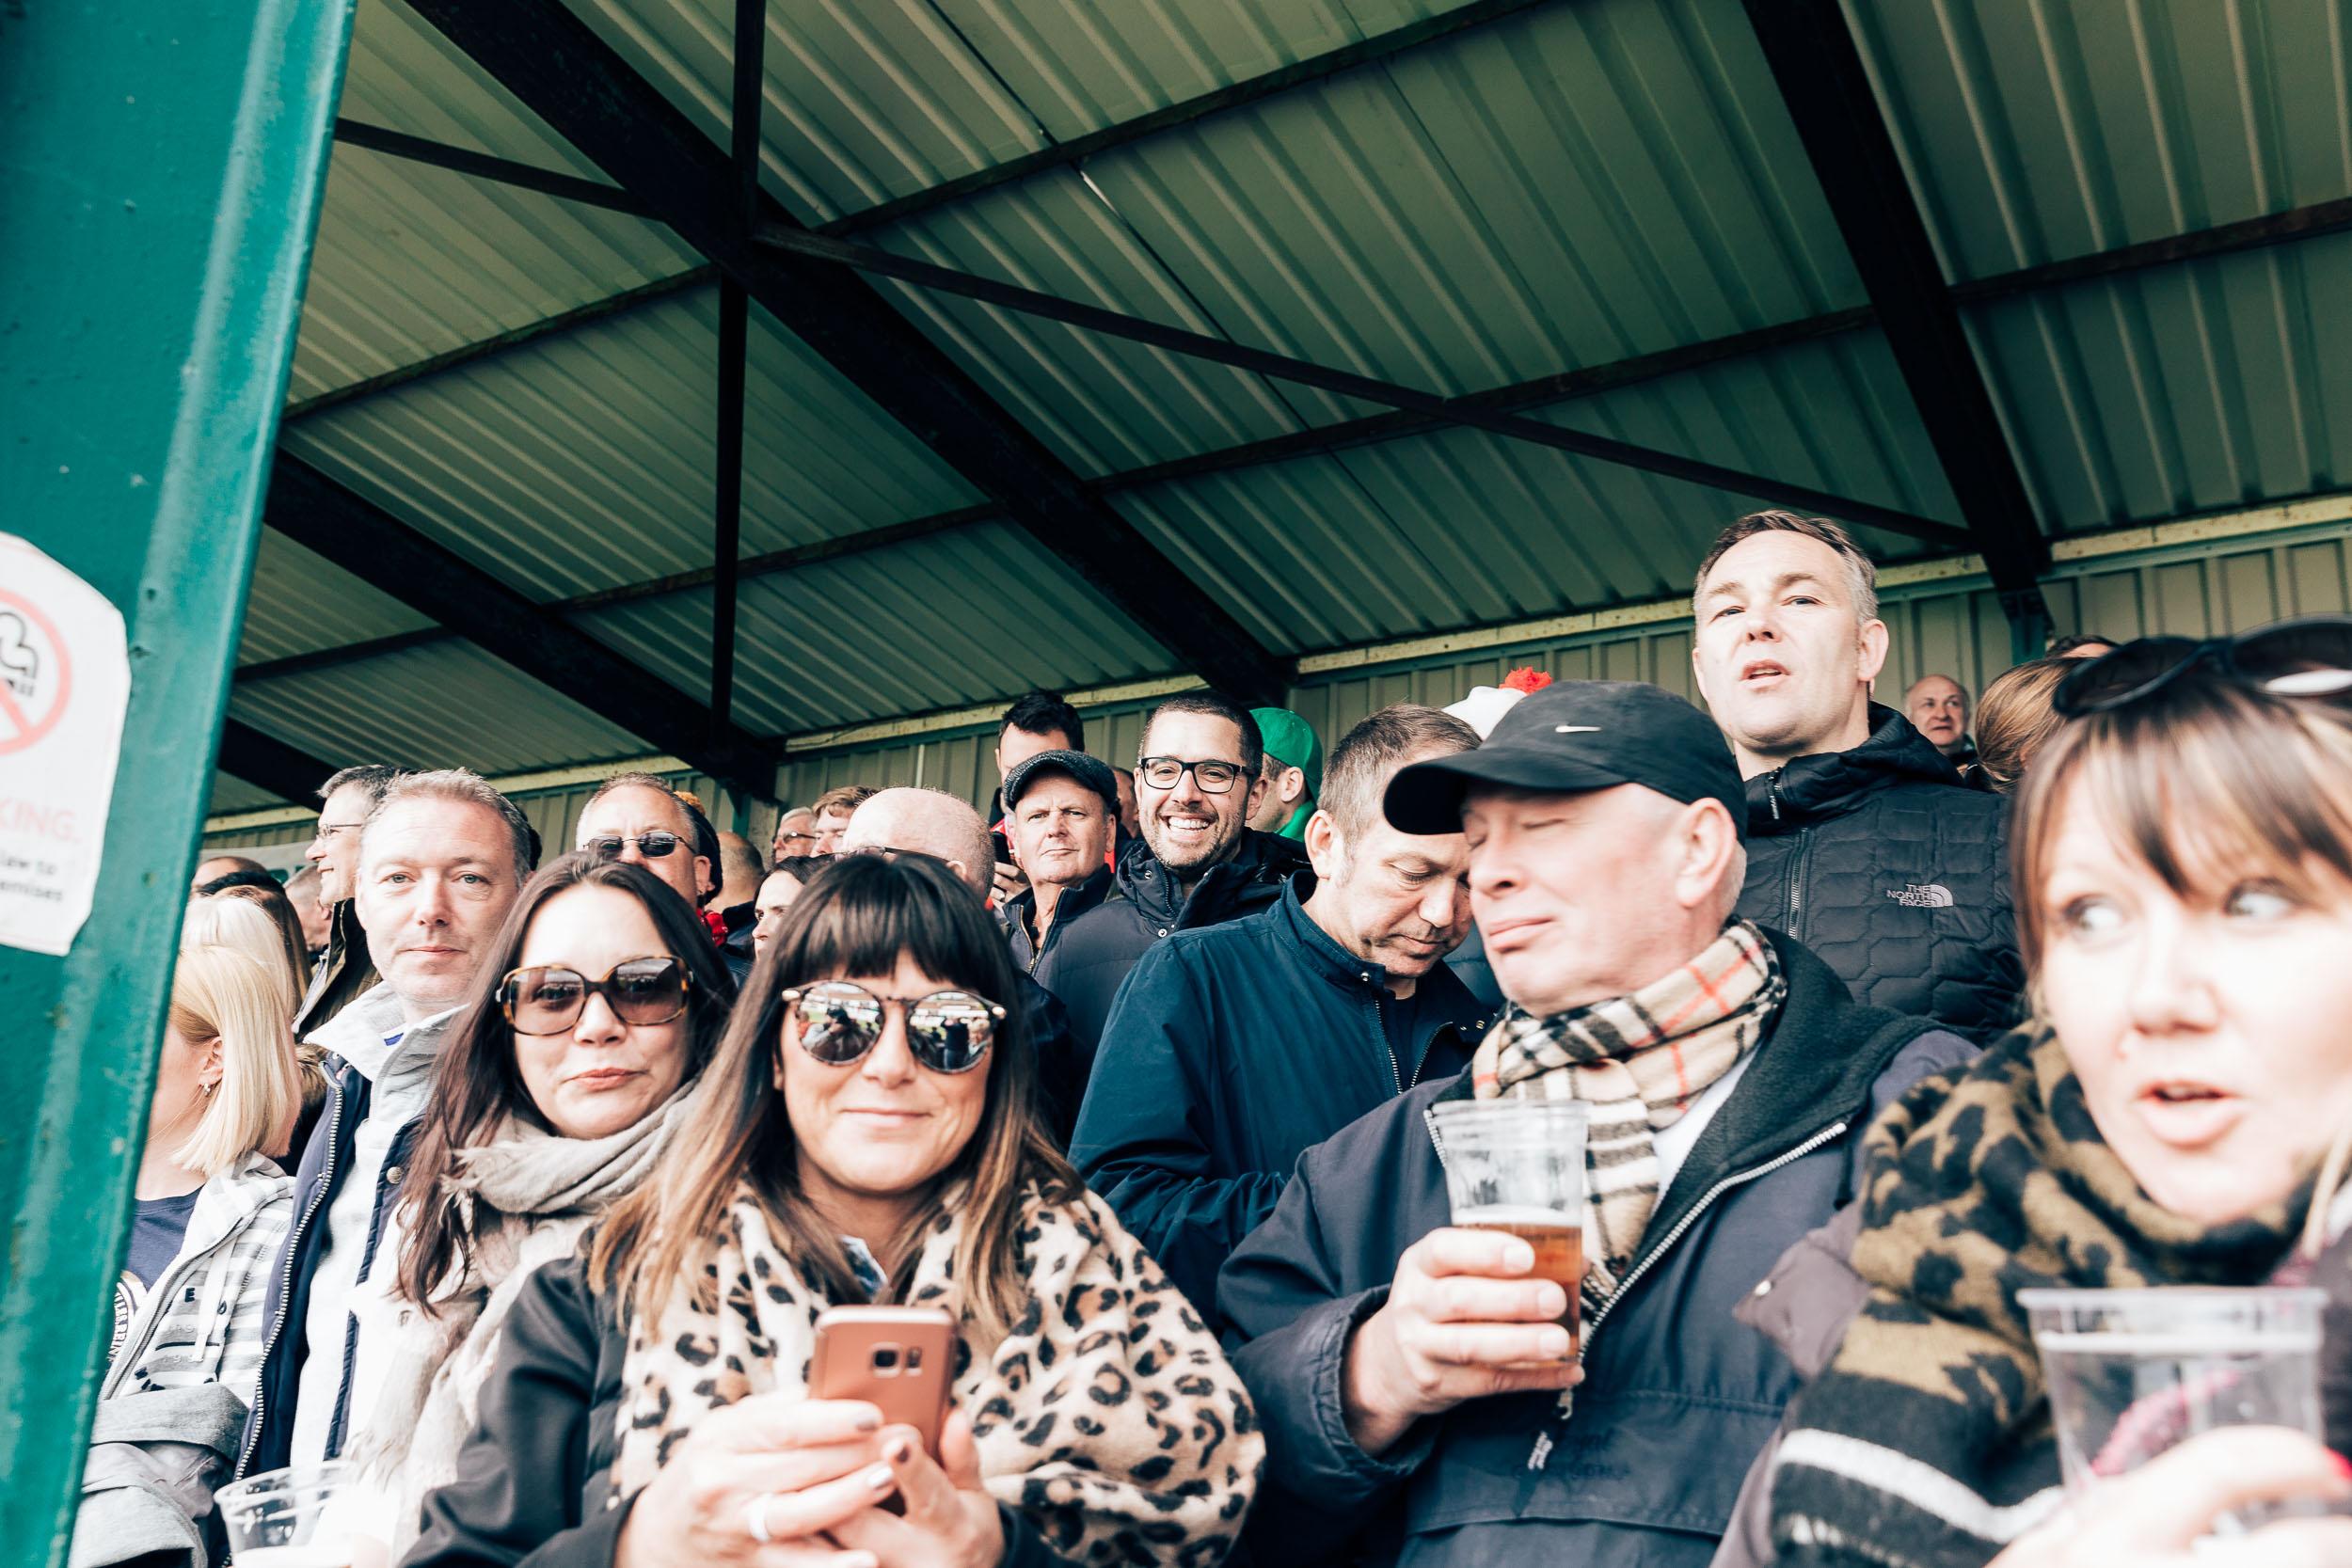 06_05_2019_Bromsgrove_Sporting_Corby-47.jpg